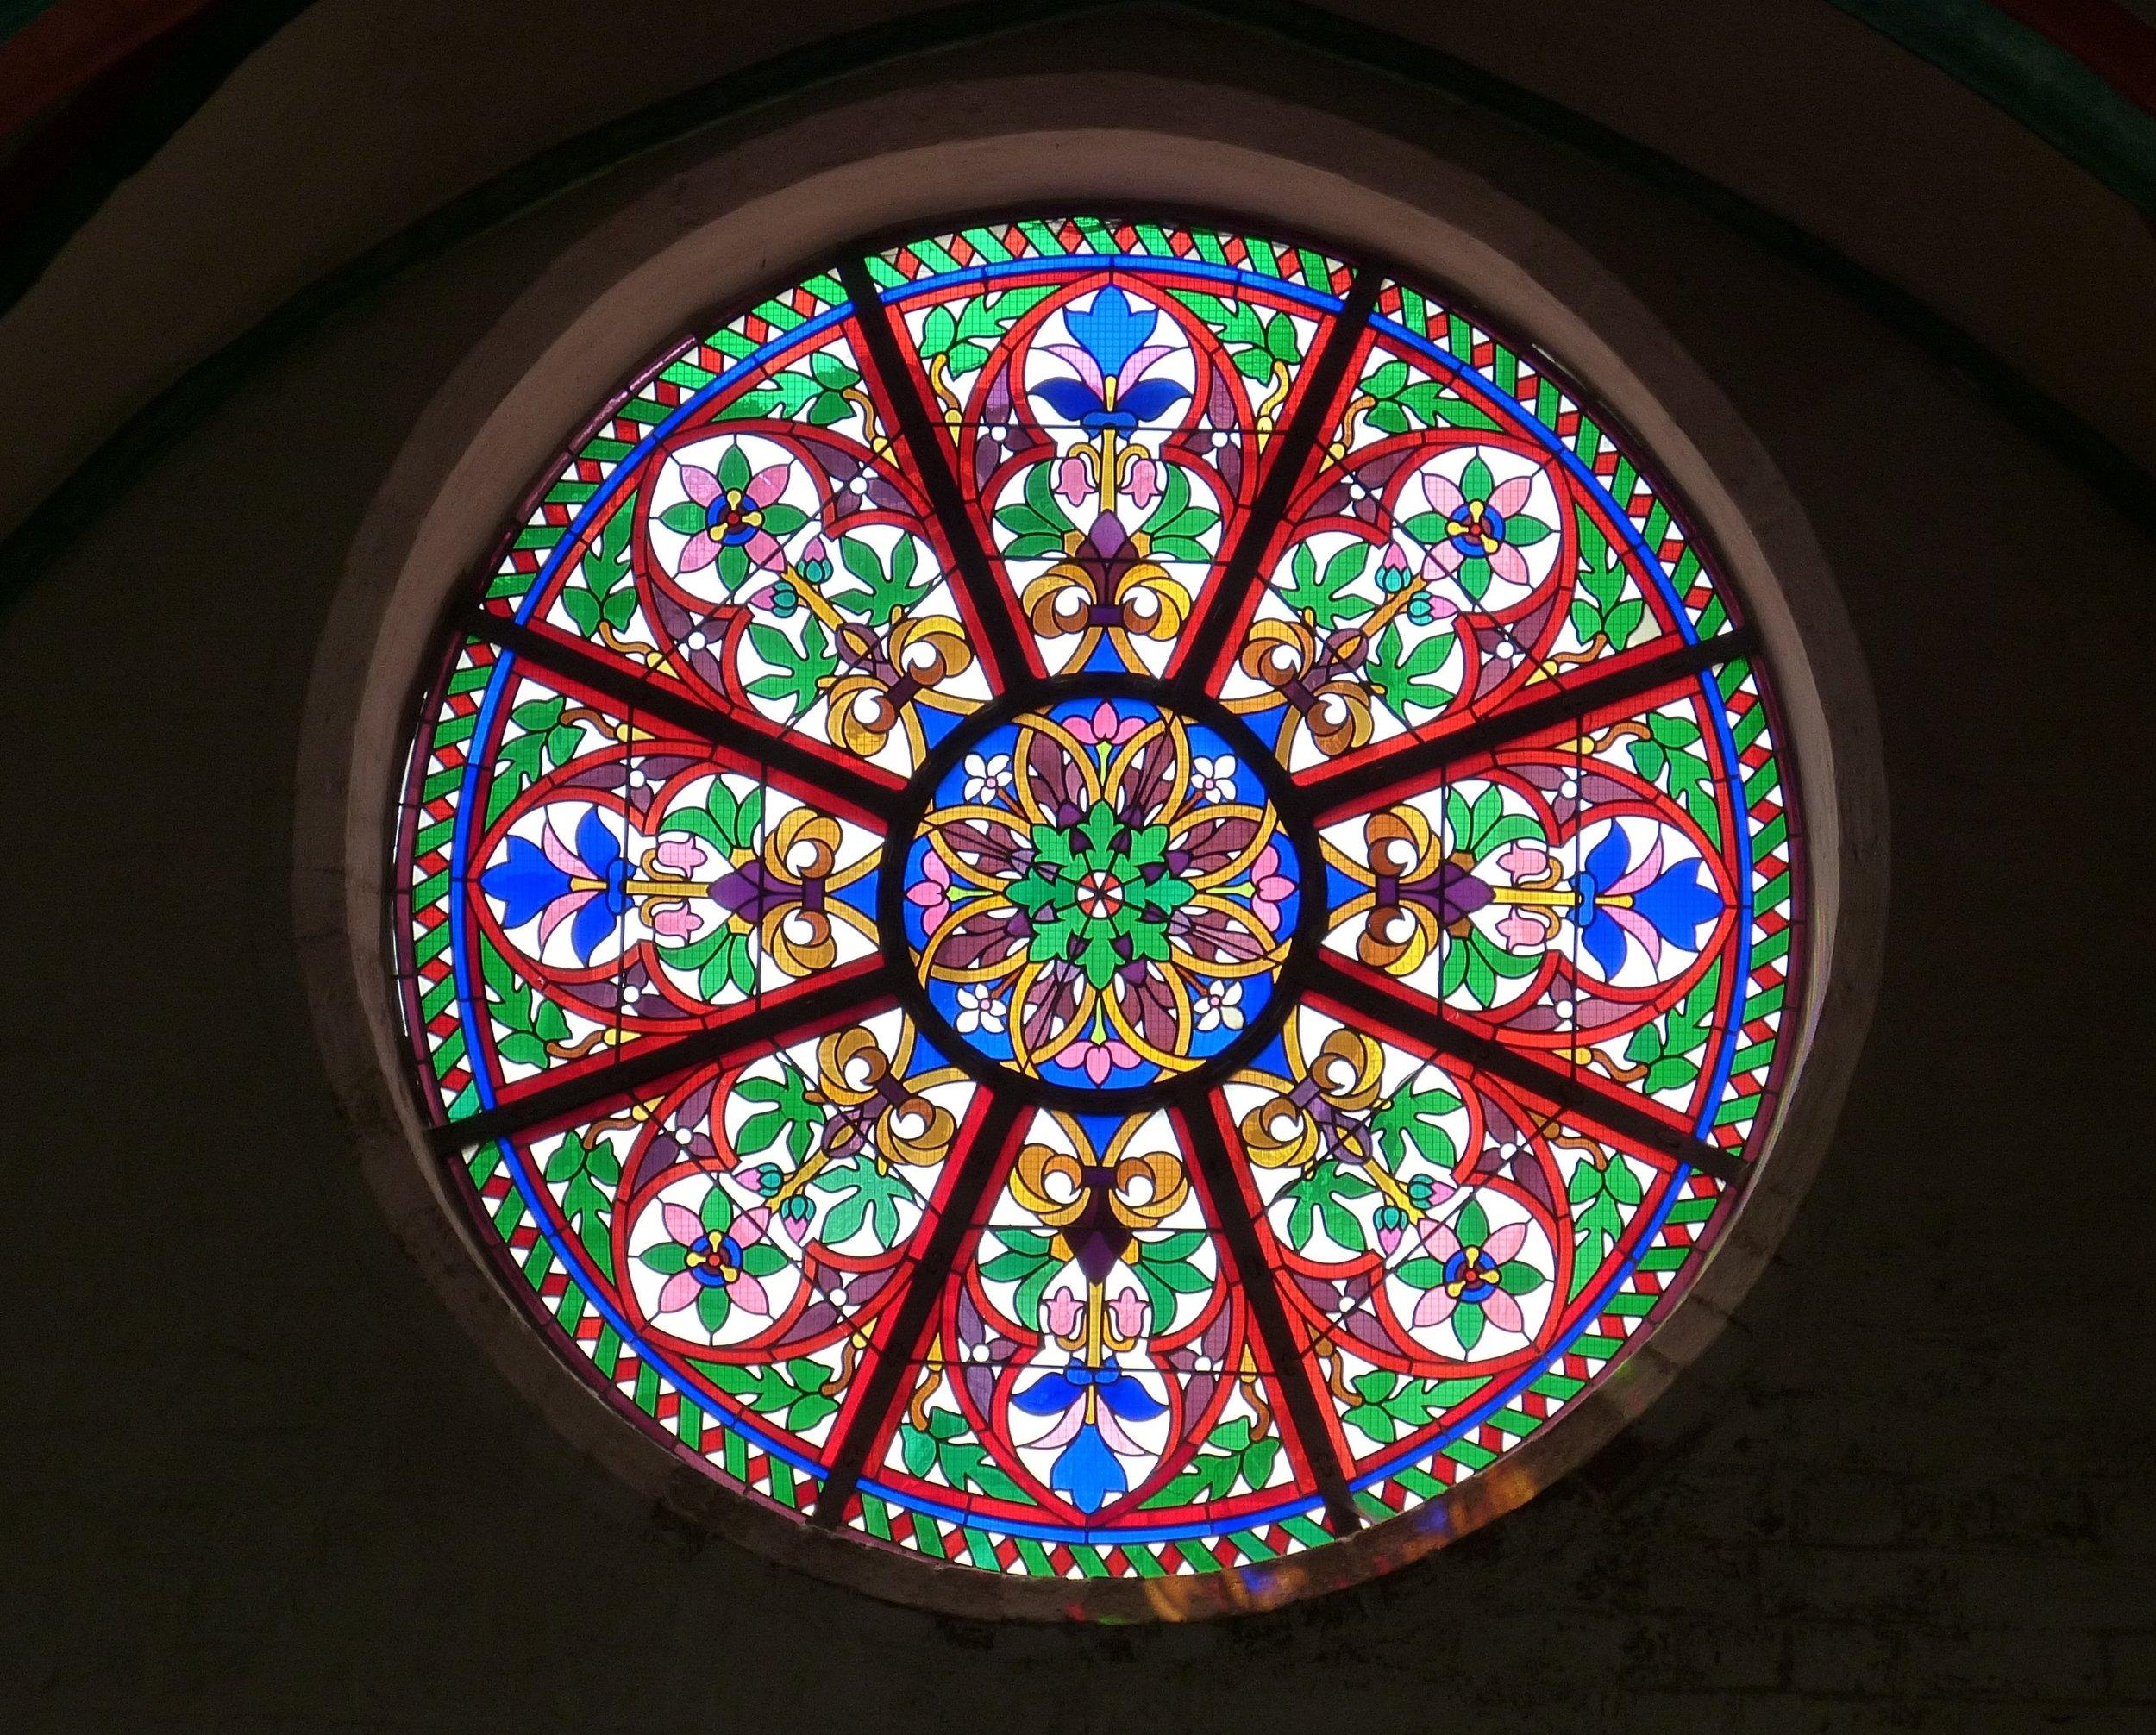 Beautiful Circular Stained-Glass Window